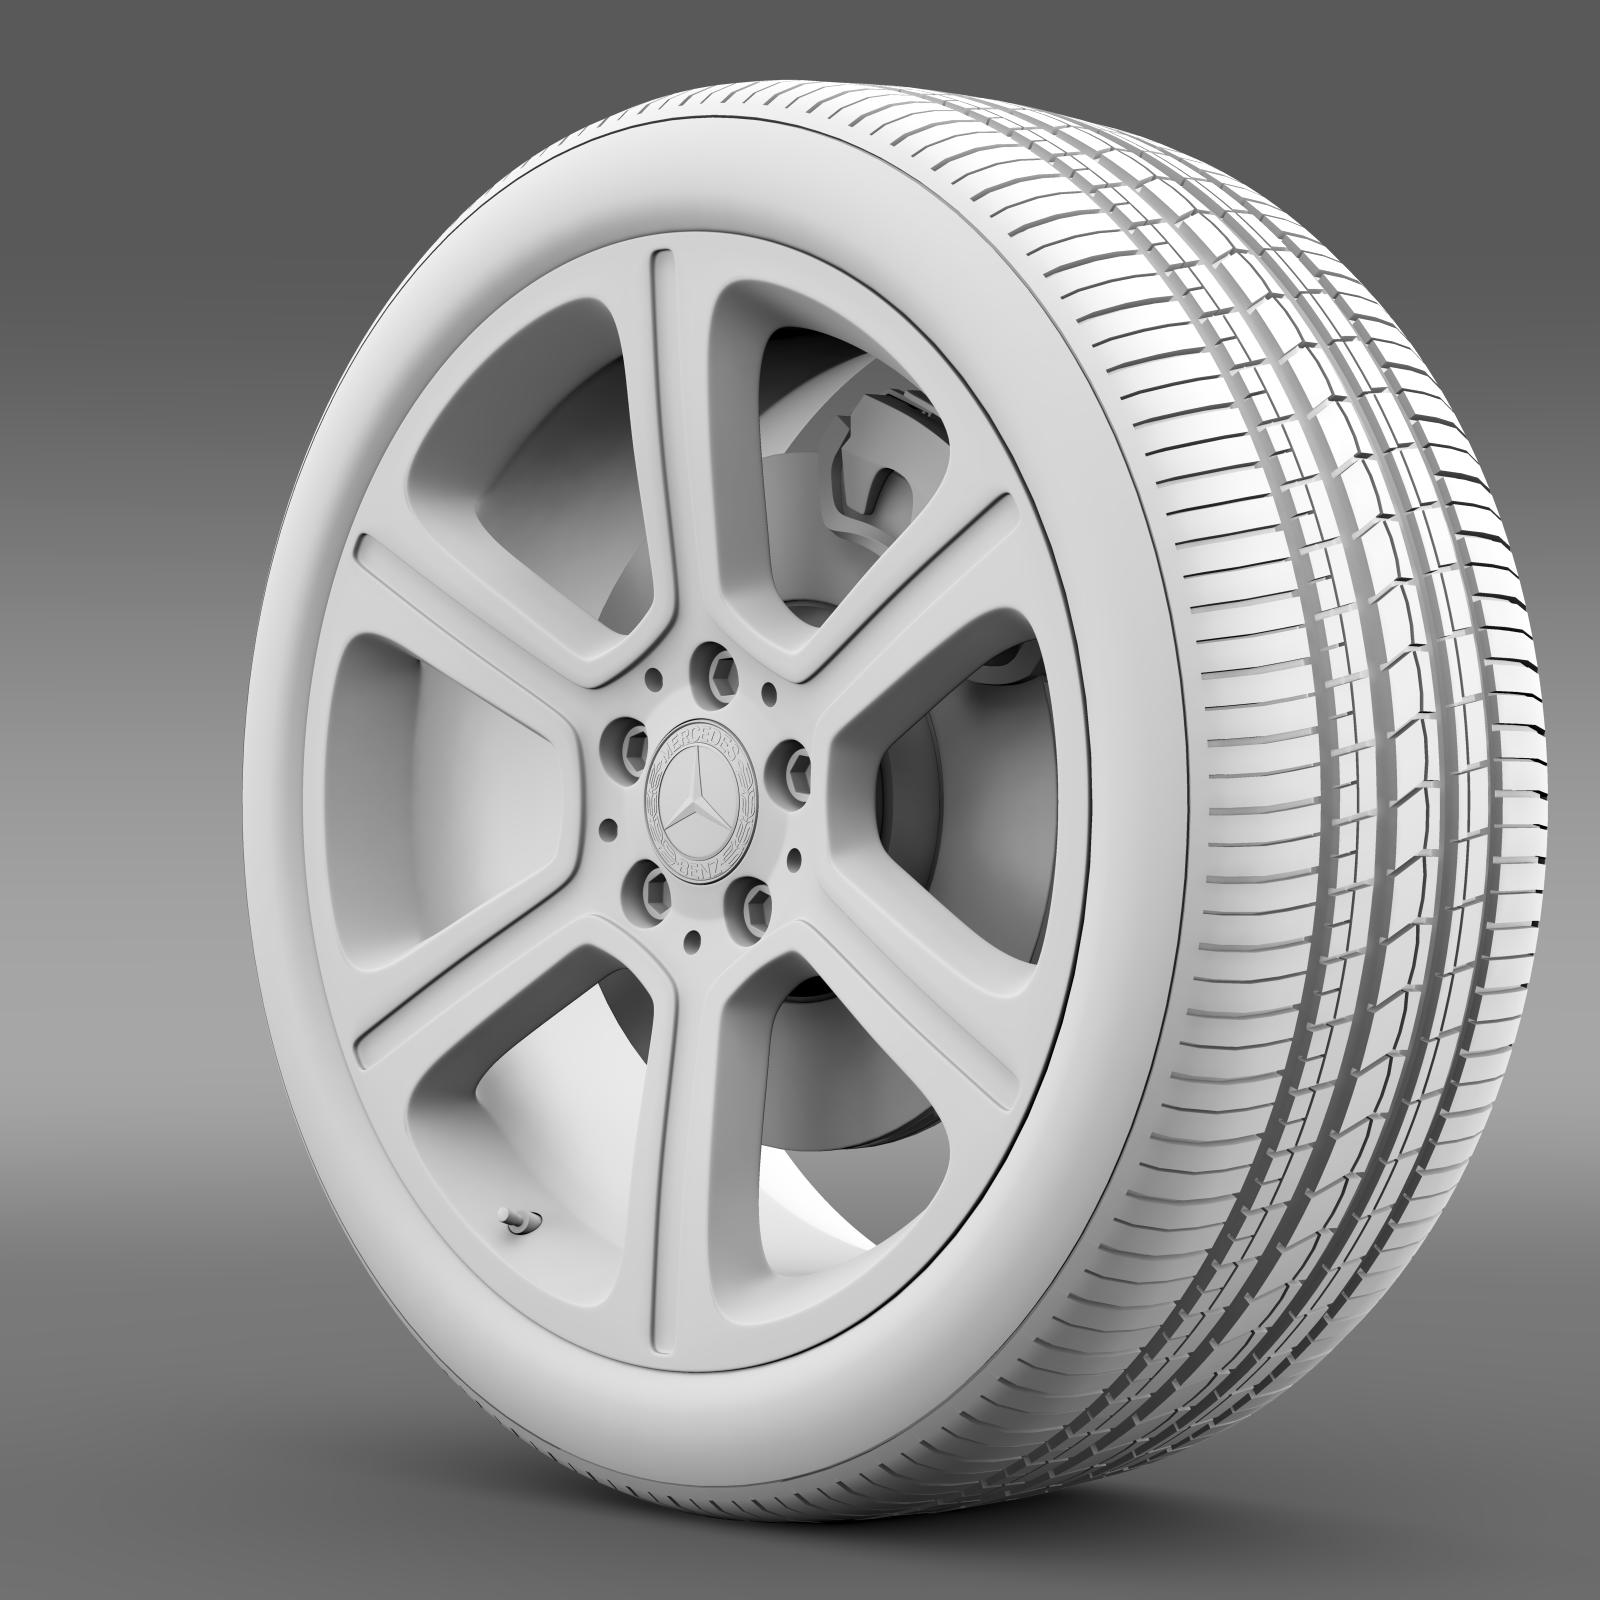 mercedes benz c 300 exclusive line wheel 3d model 3ds max fbx c4d lwo ma mb hrc xsi obj 210776